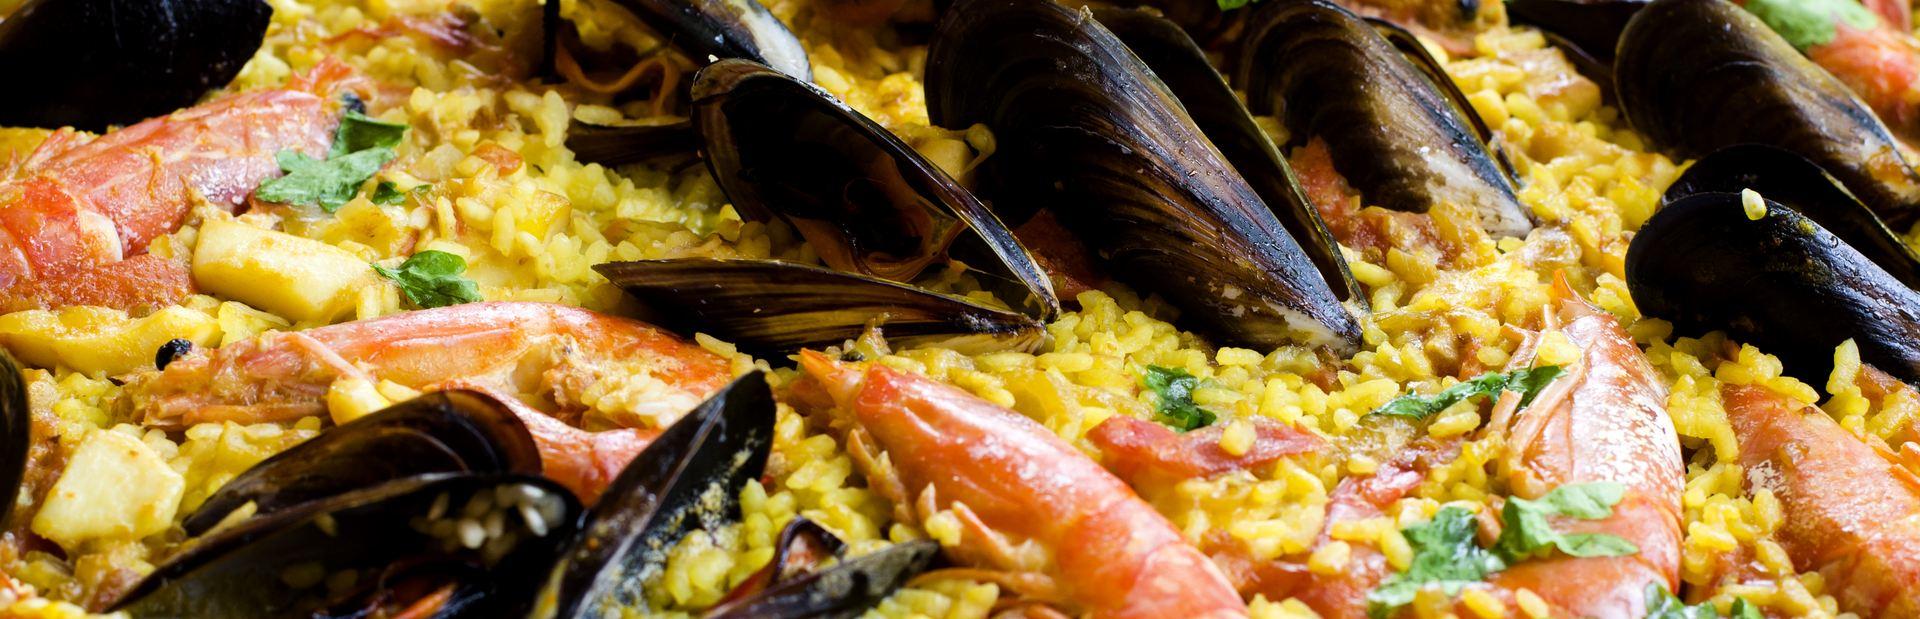 Eat & drink inThe Balearics